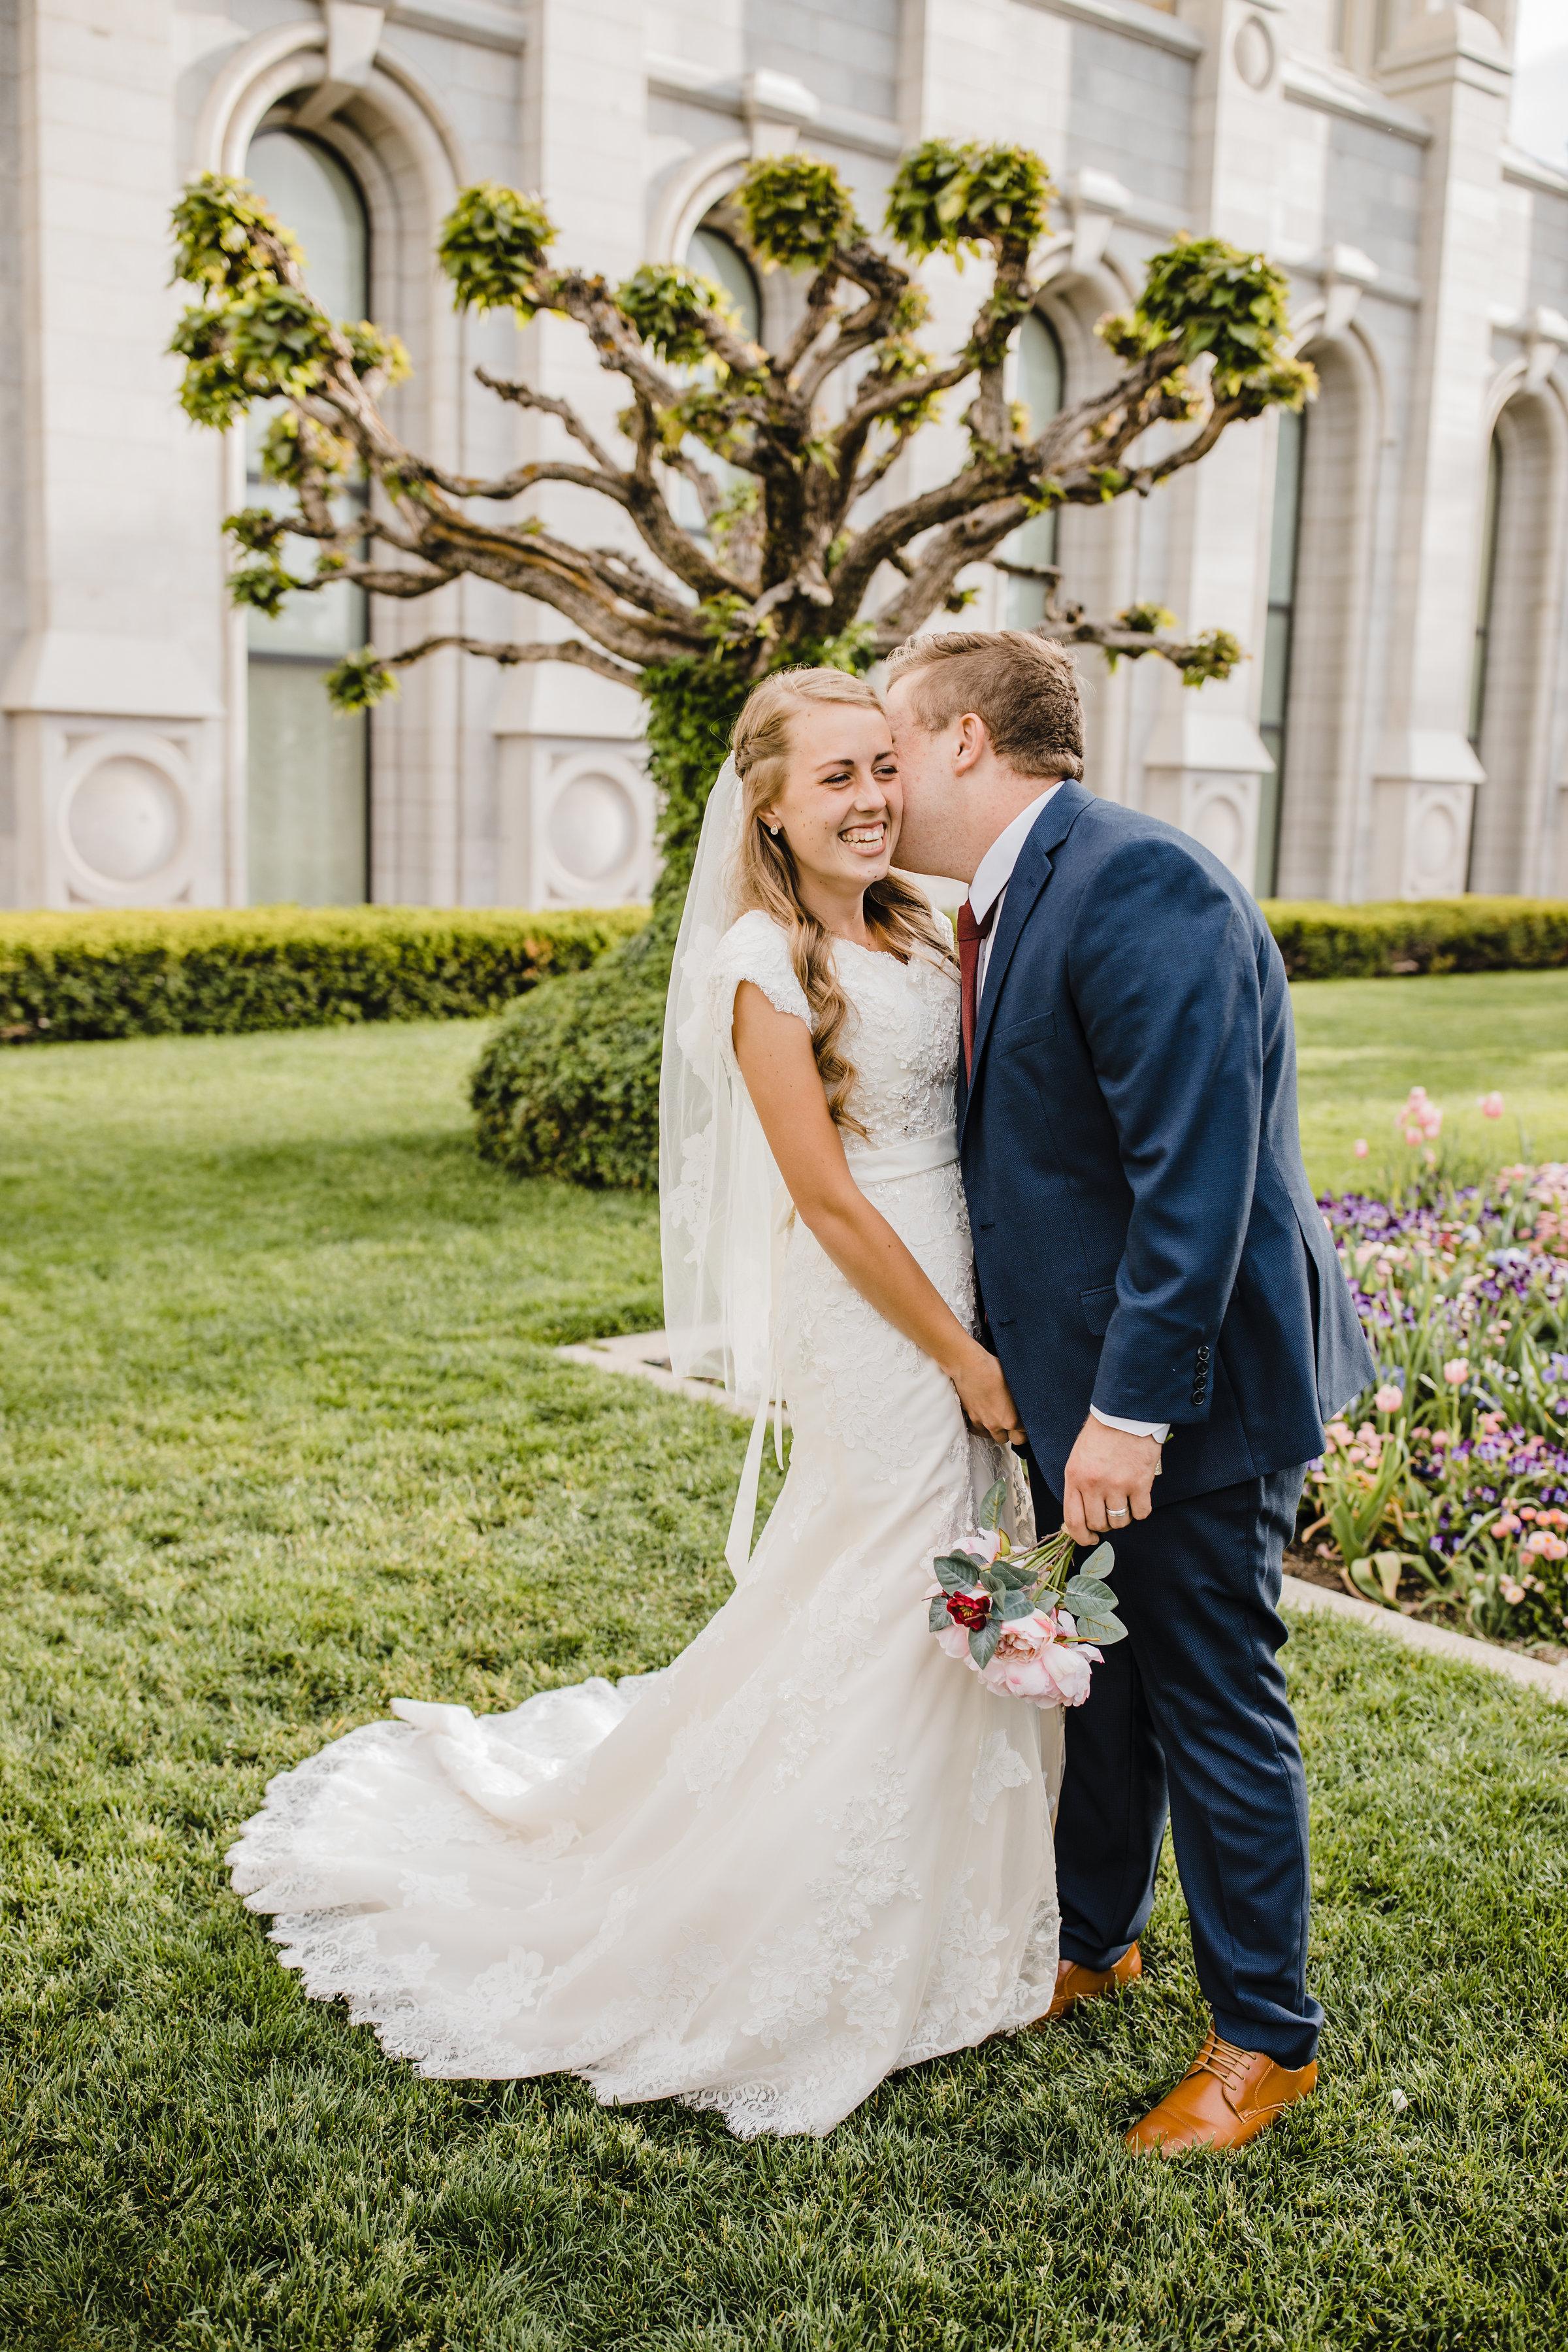 professional wedding photographer in lakewood colorado lds temple wedding salt lake wedding photographer kissing temple grounds